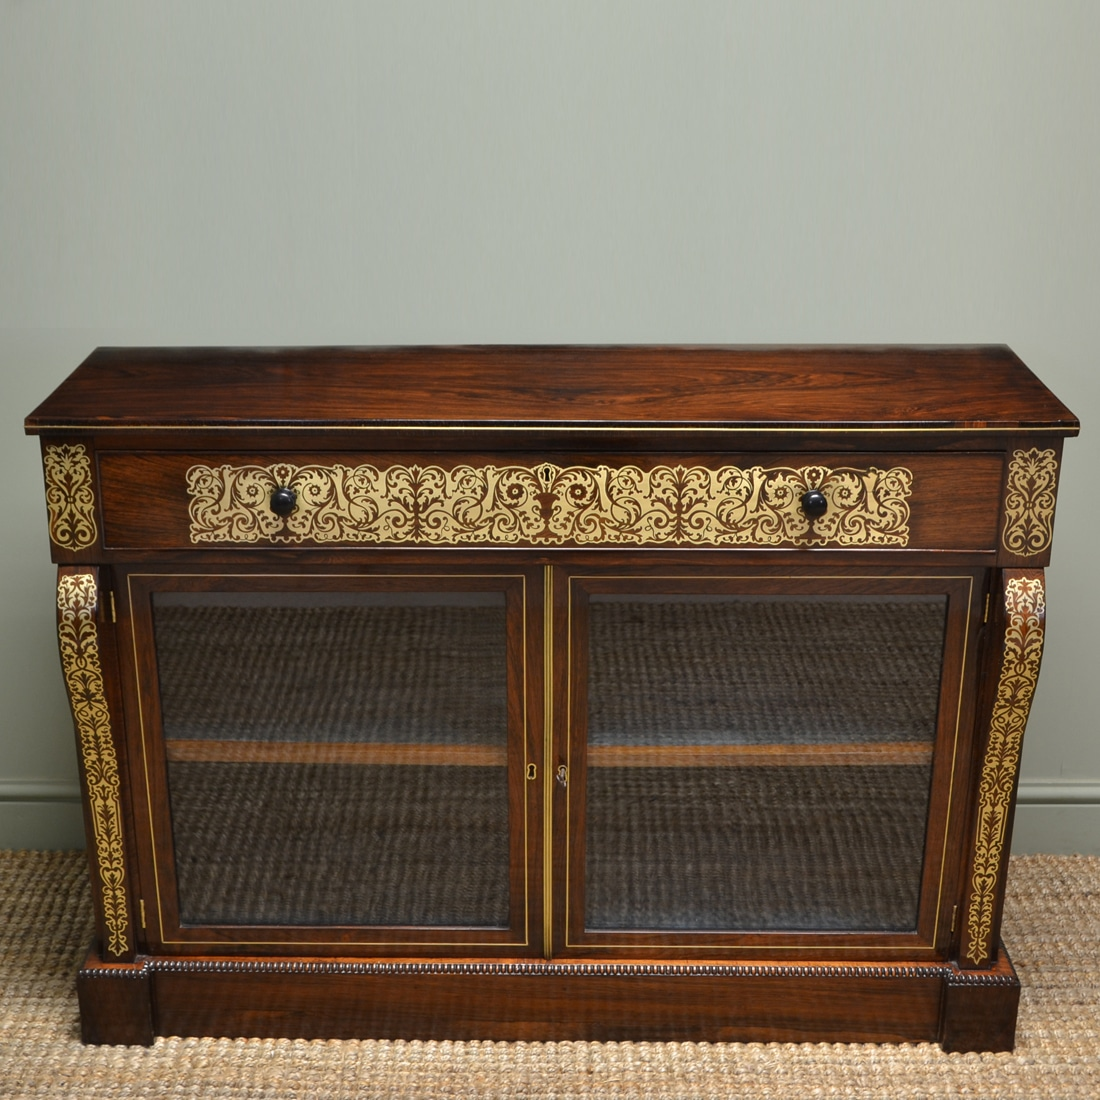 Spectacular Regency Rosewood Brass Inlaid Antique Secretaire Cabinet